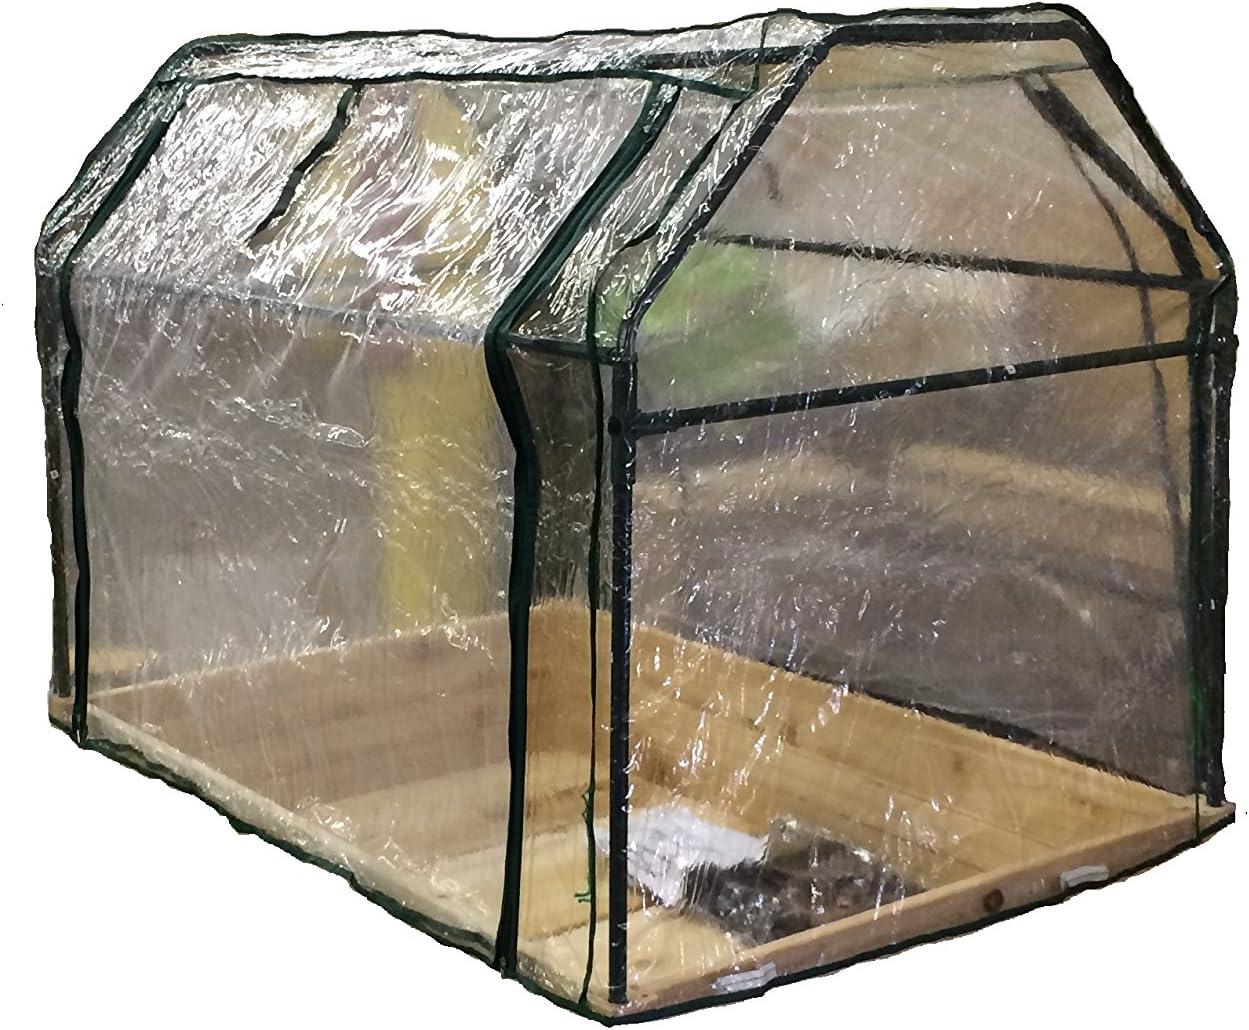 Raised 3 x 4 Eden Raised Garden Optional Enclosure Only